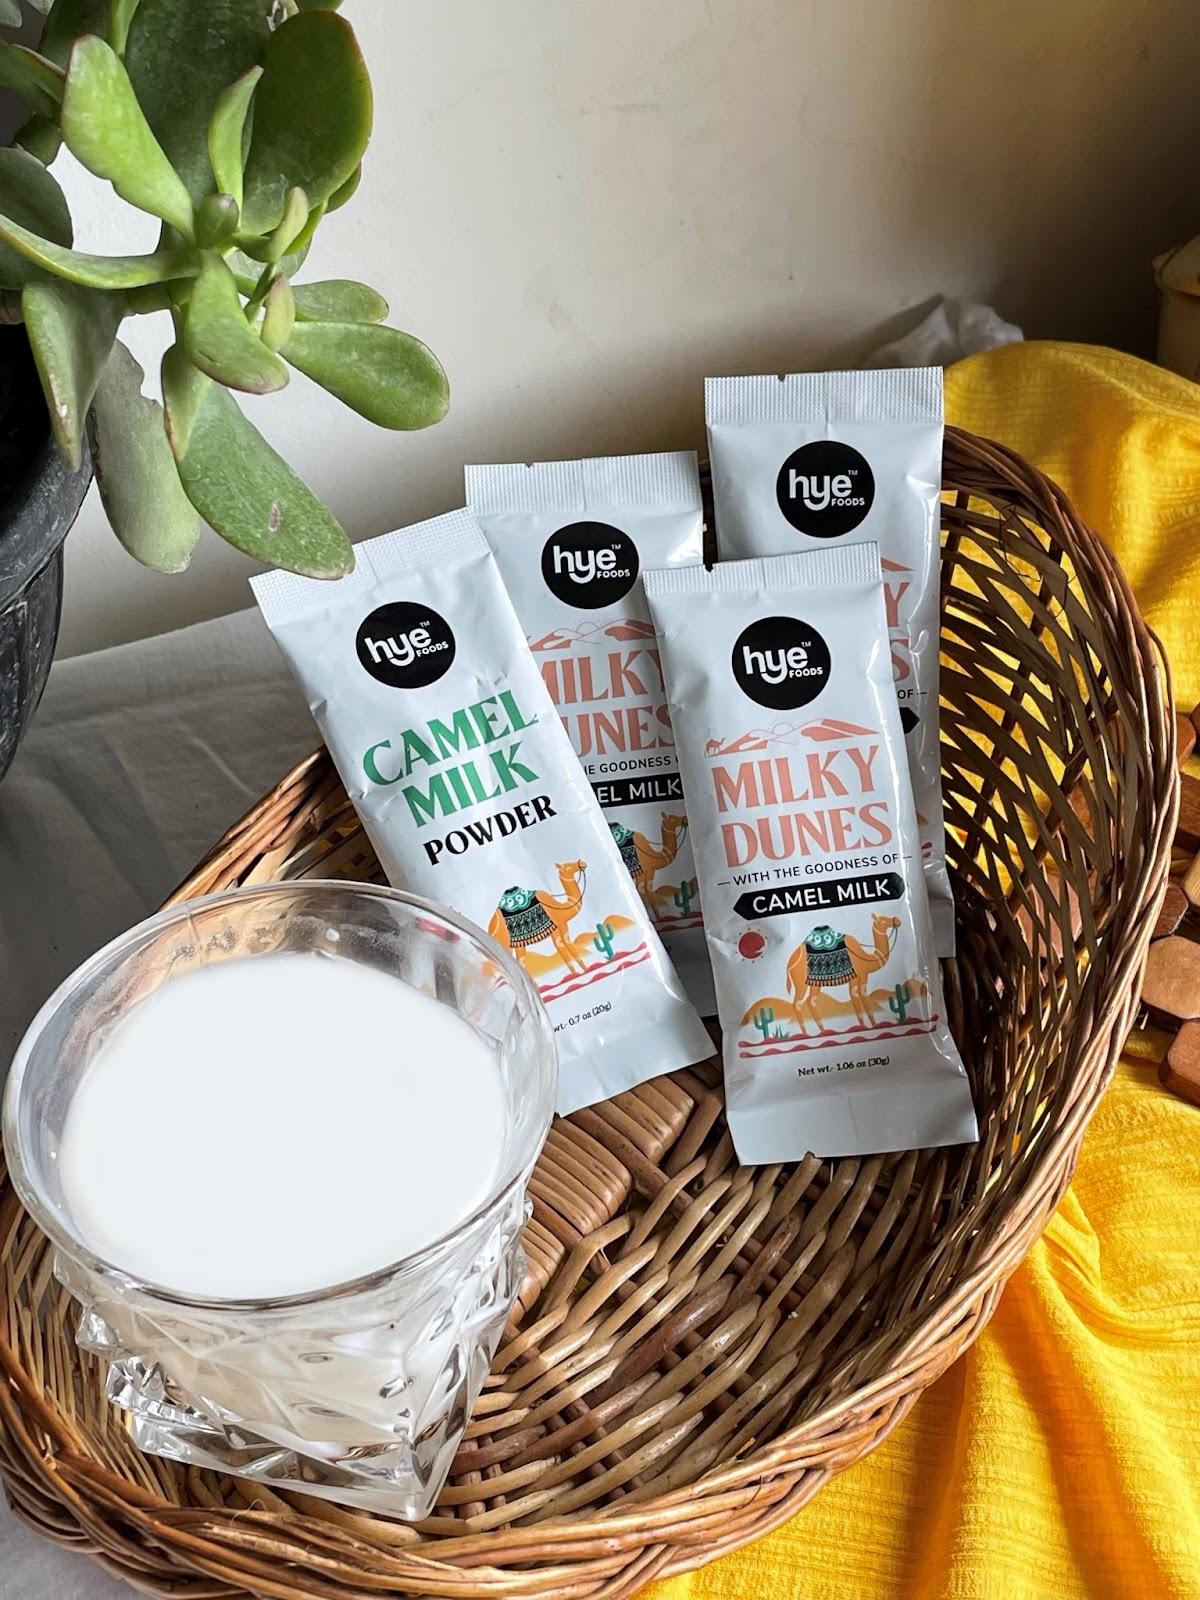 Camel Milk: A Better Choice for Lactose Intolerants?